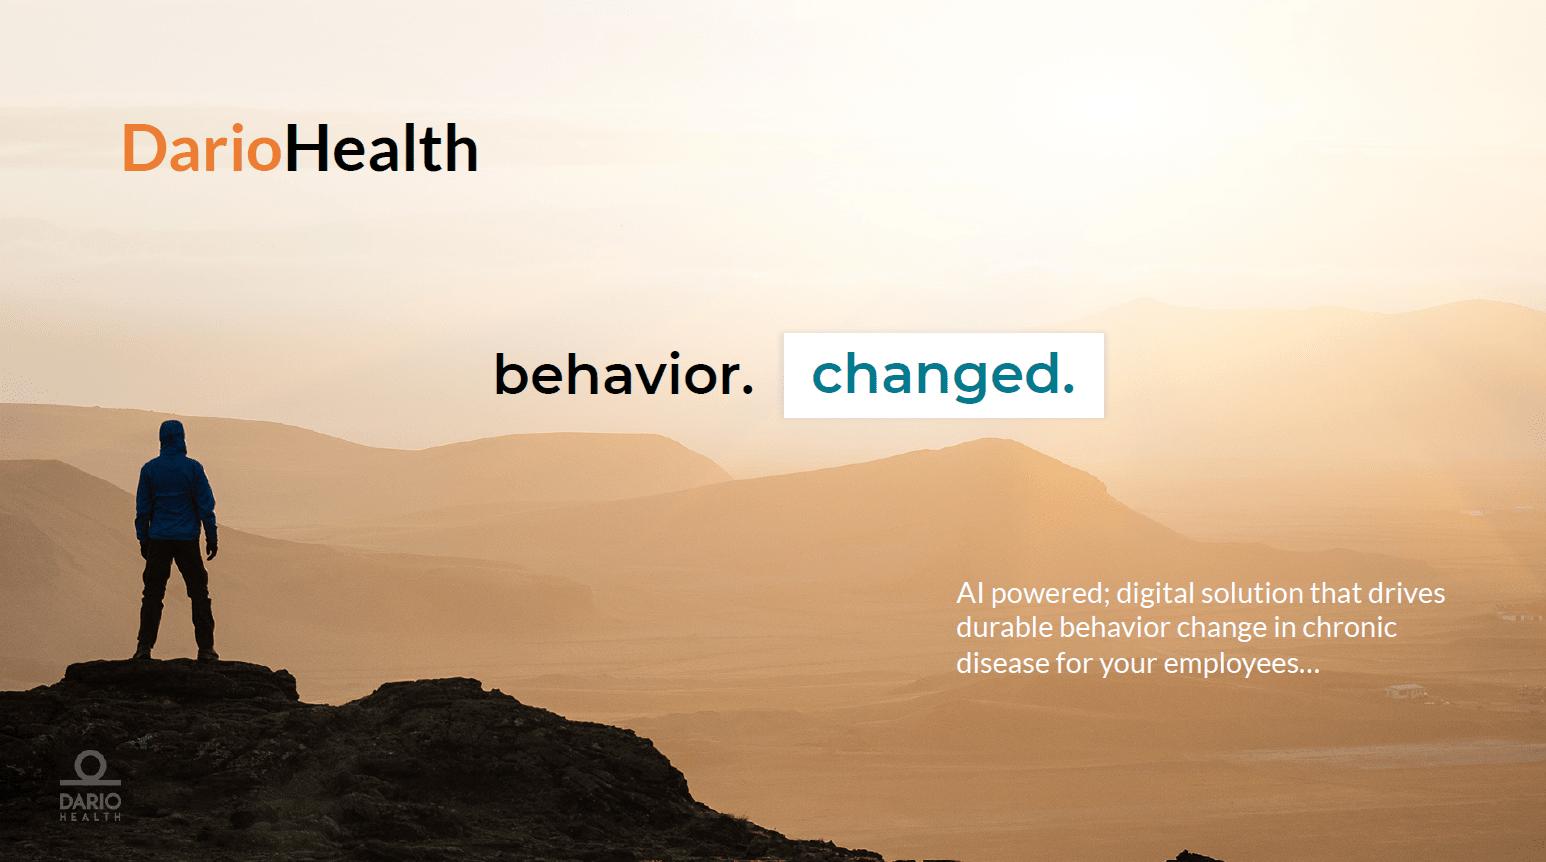 DarioHealth-drives-behavior-change